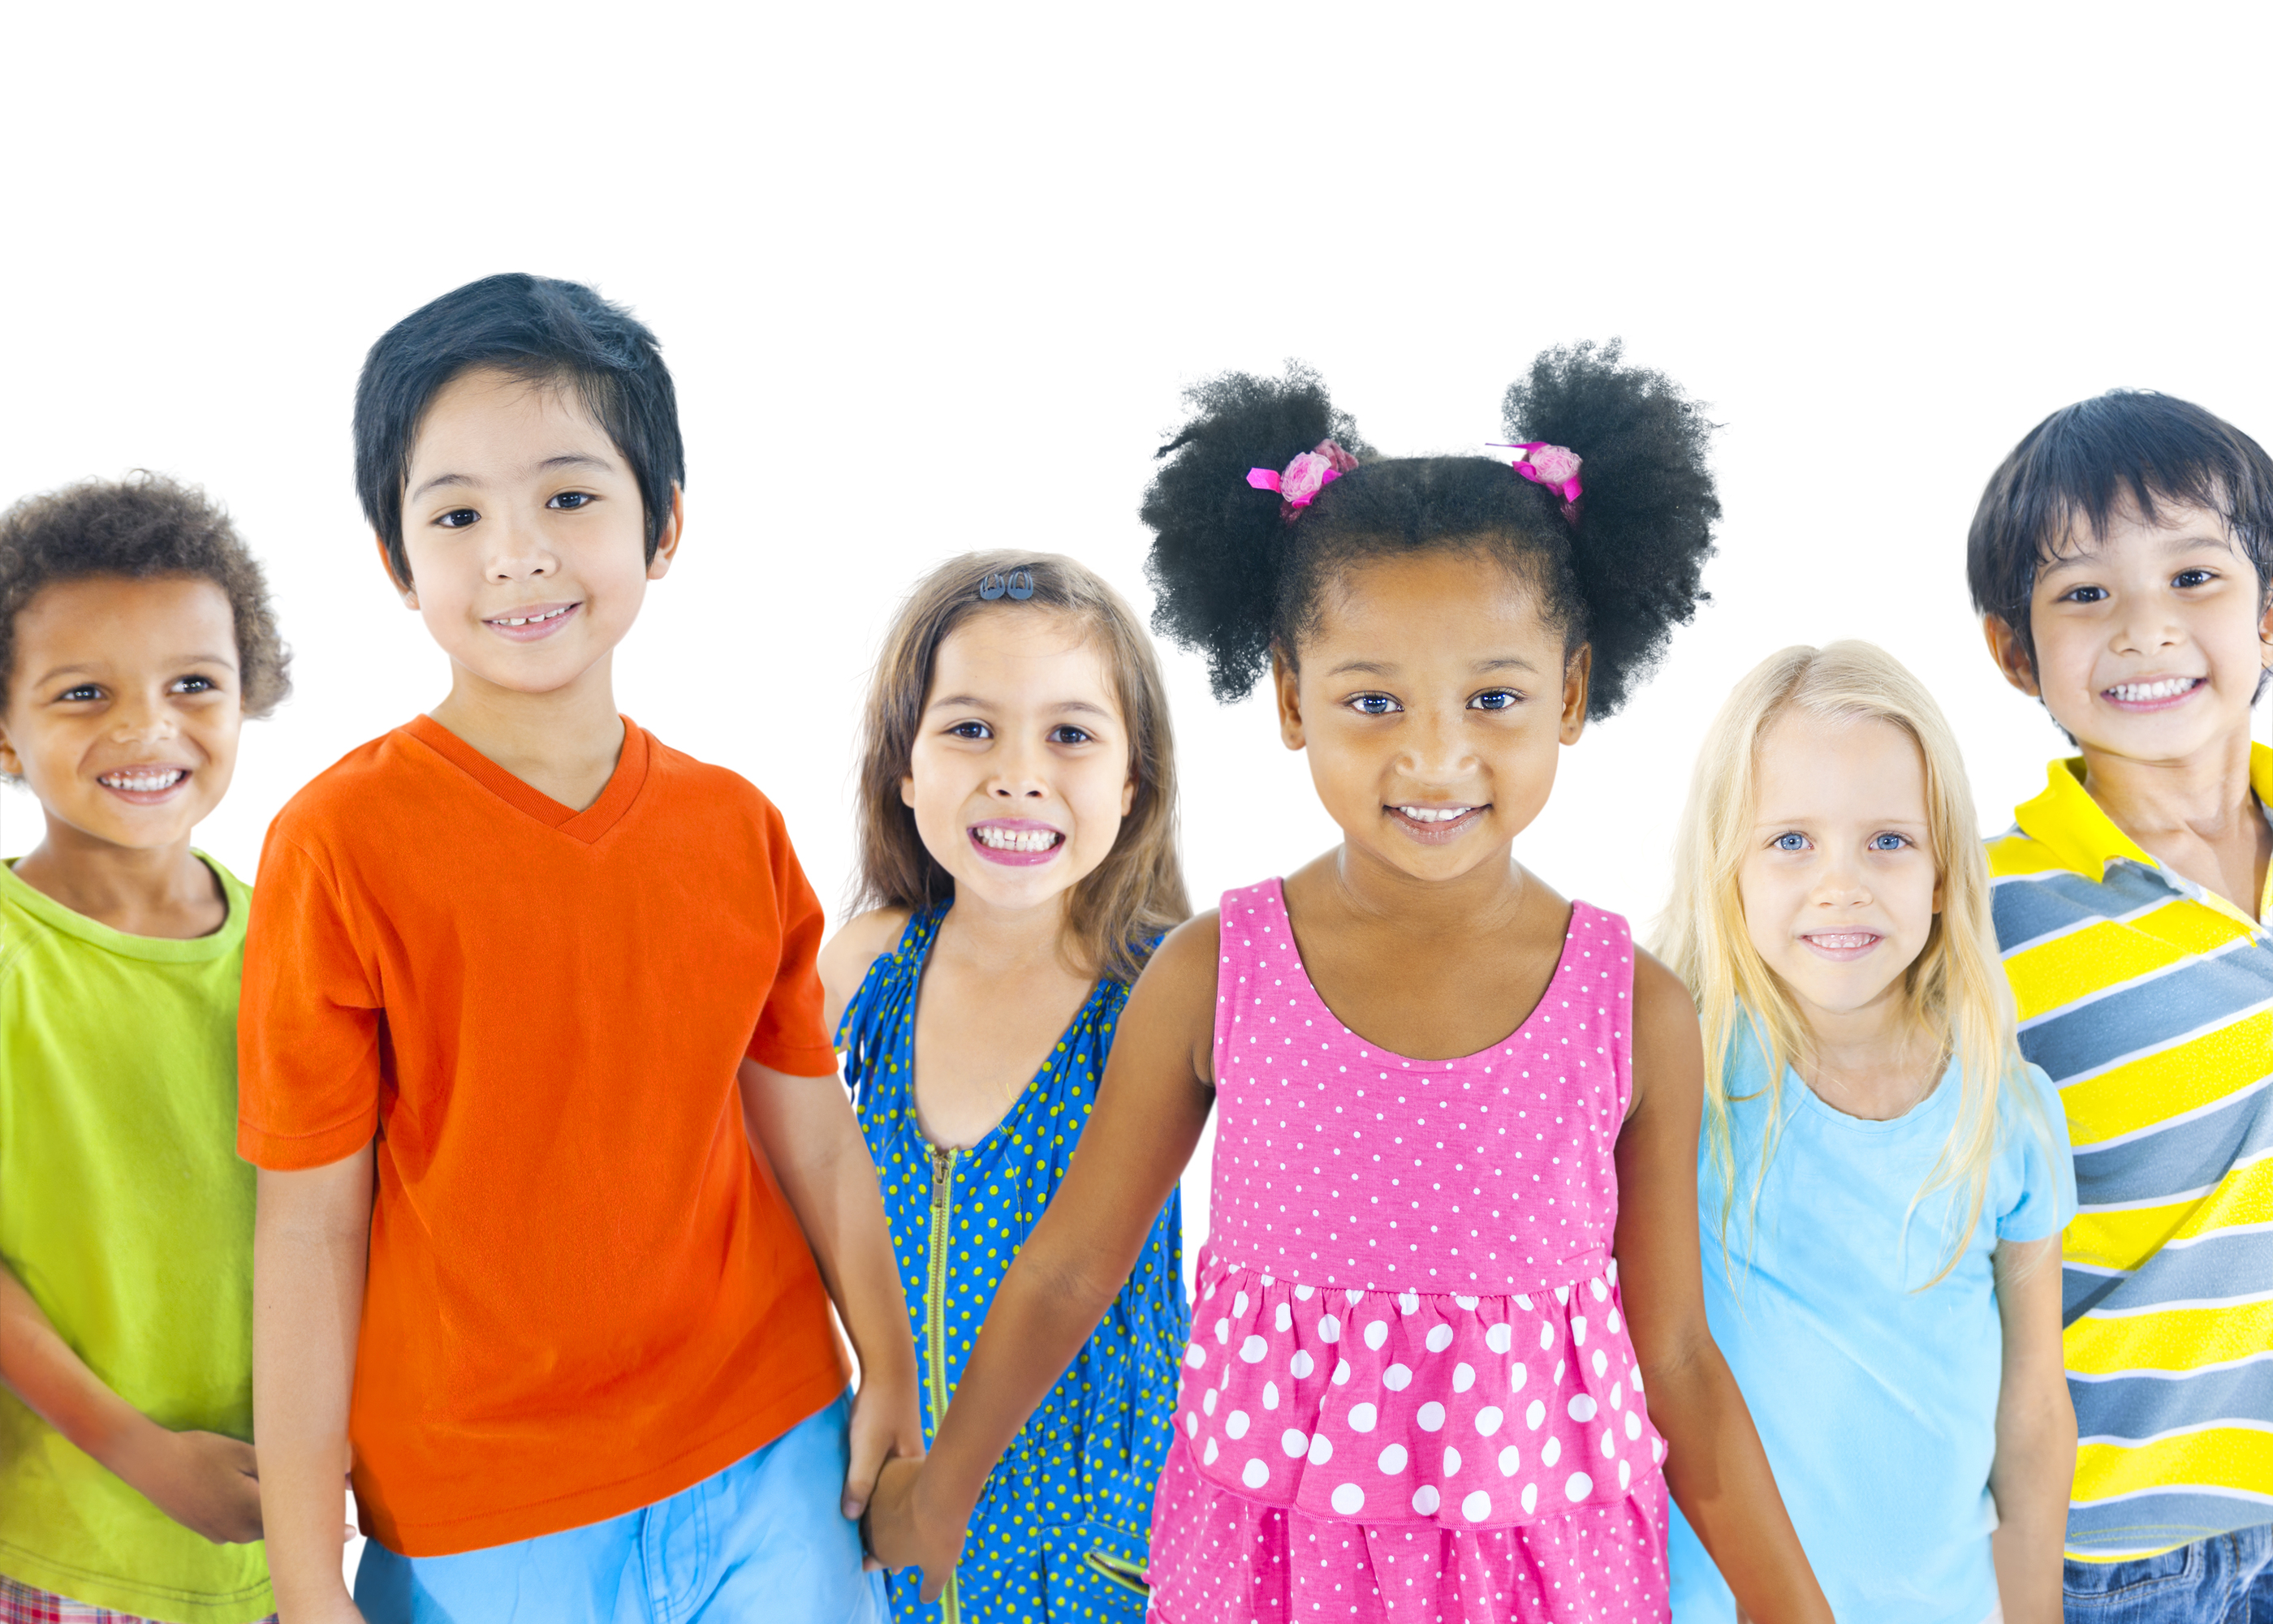 bigstock-Group-of-Children-62228456